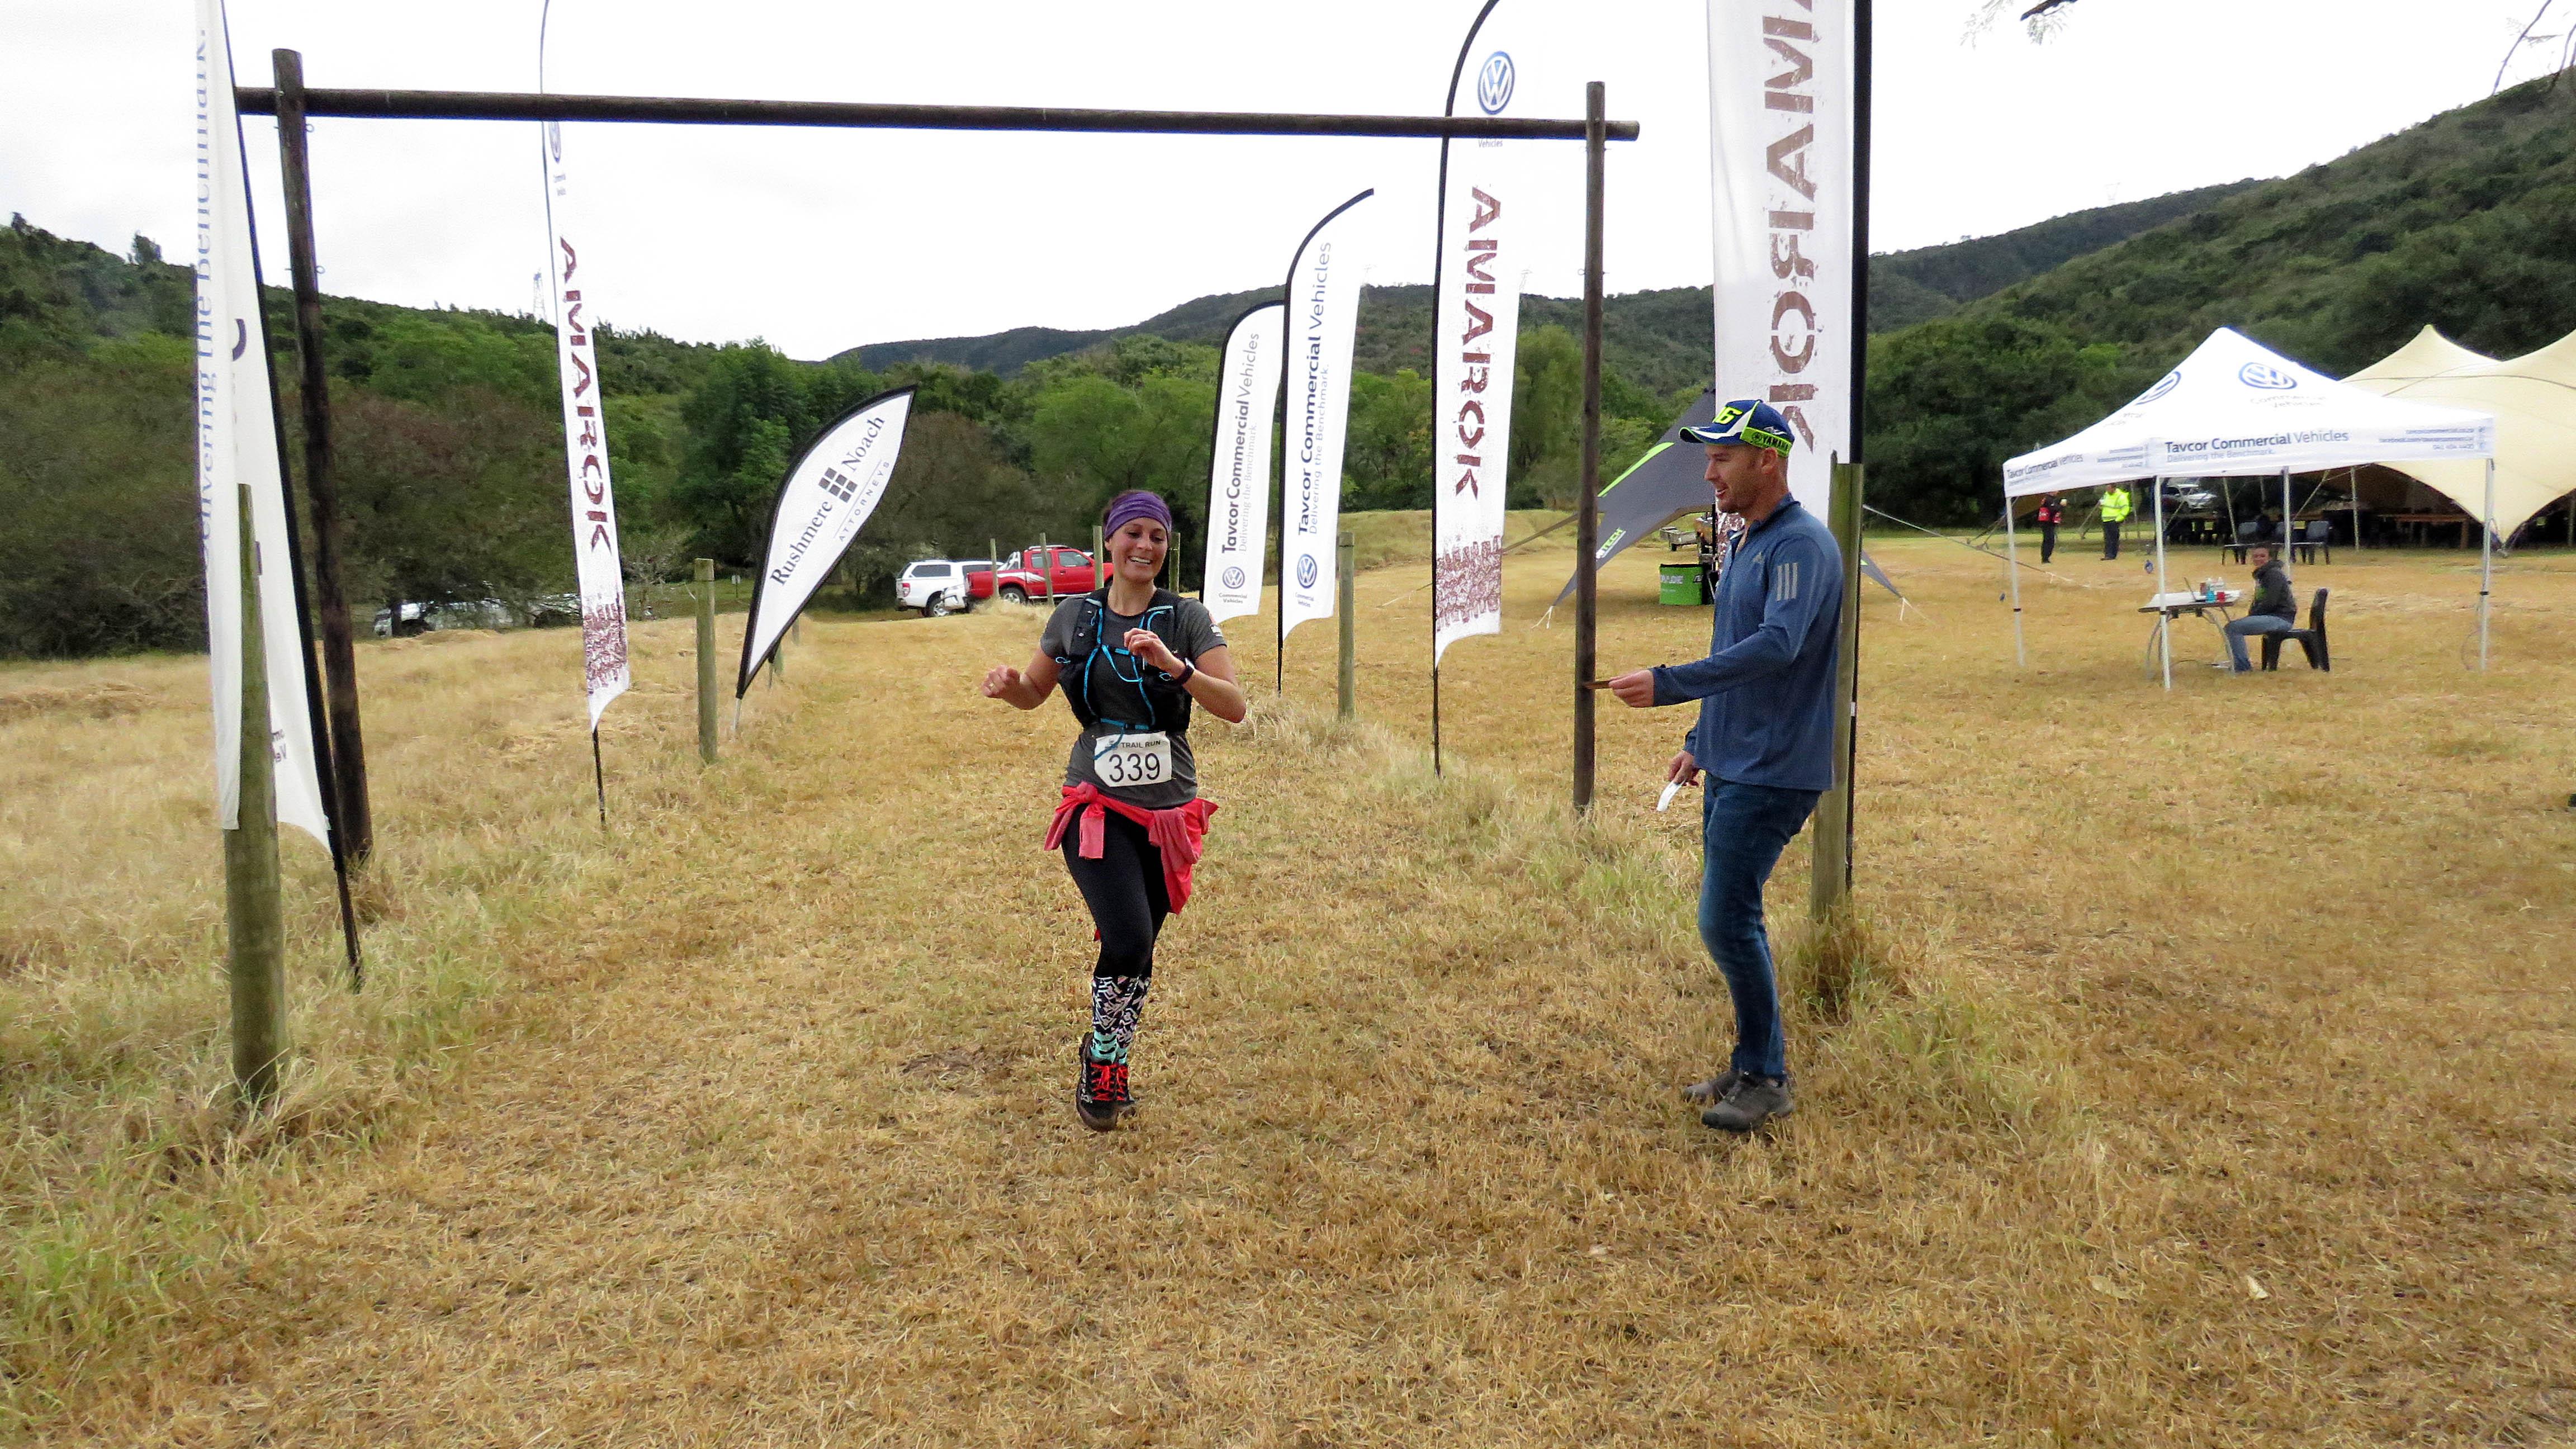 hayterdale trailrun 2018-08-05  (80)